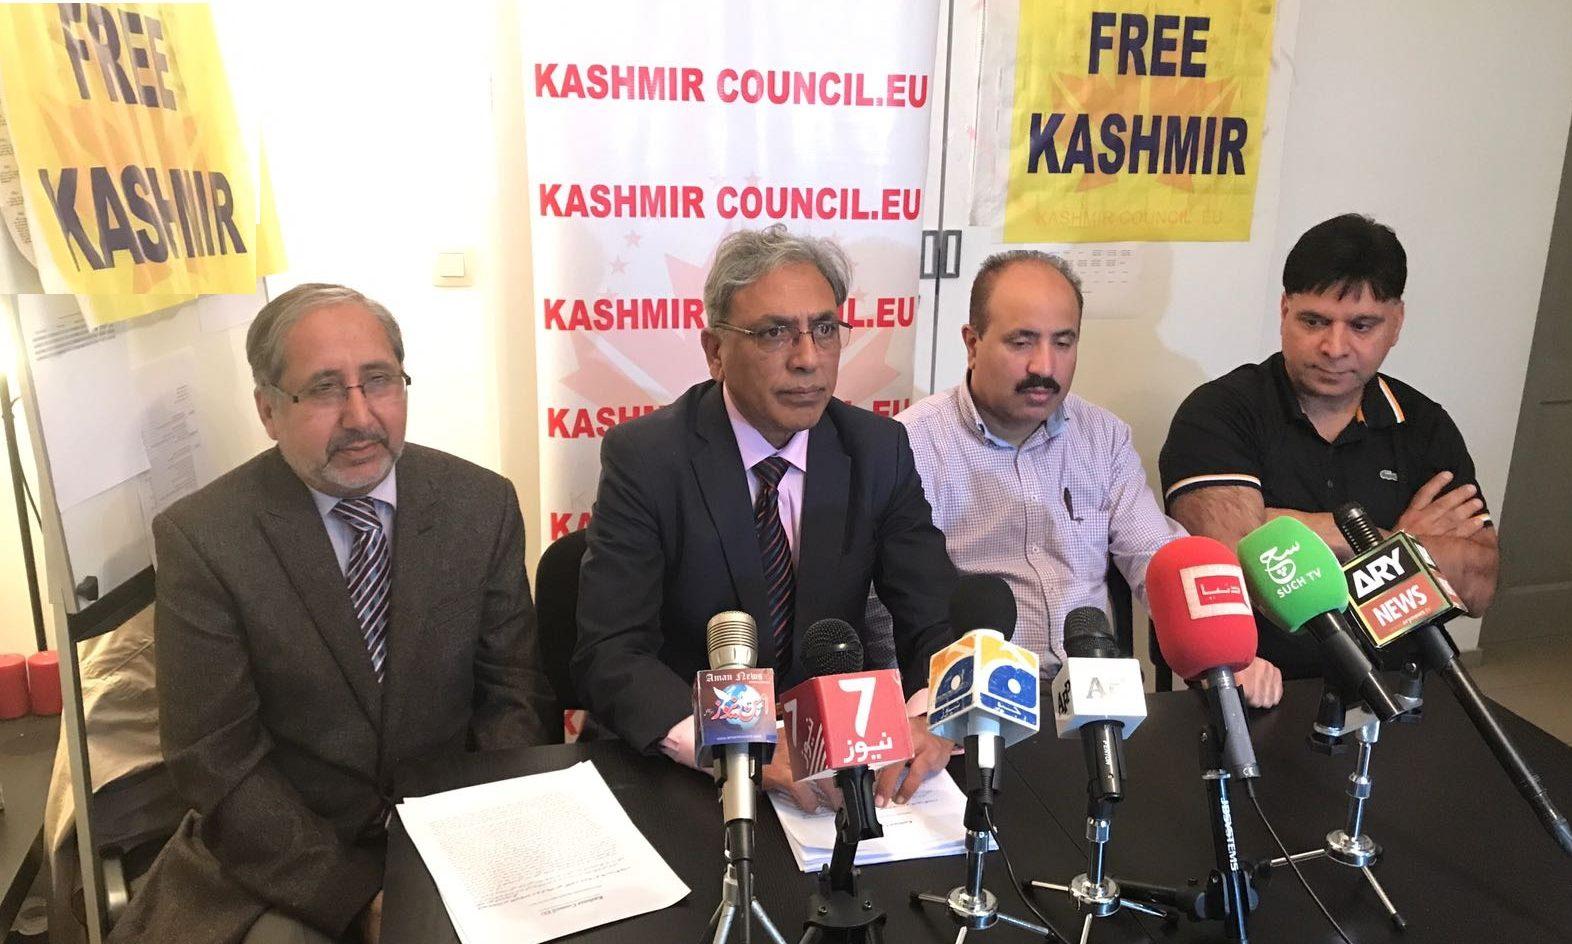 Ali Raza Syed Kashmir Council Europe